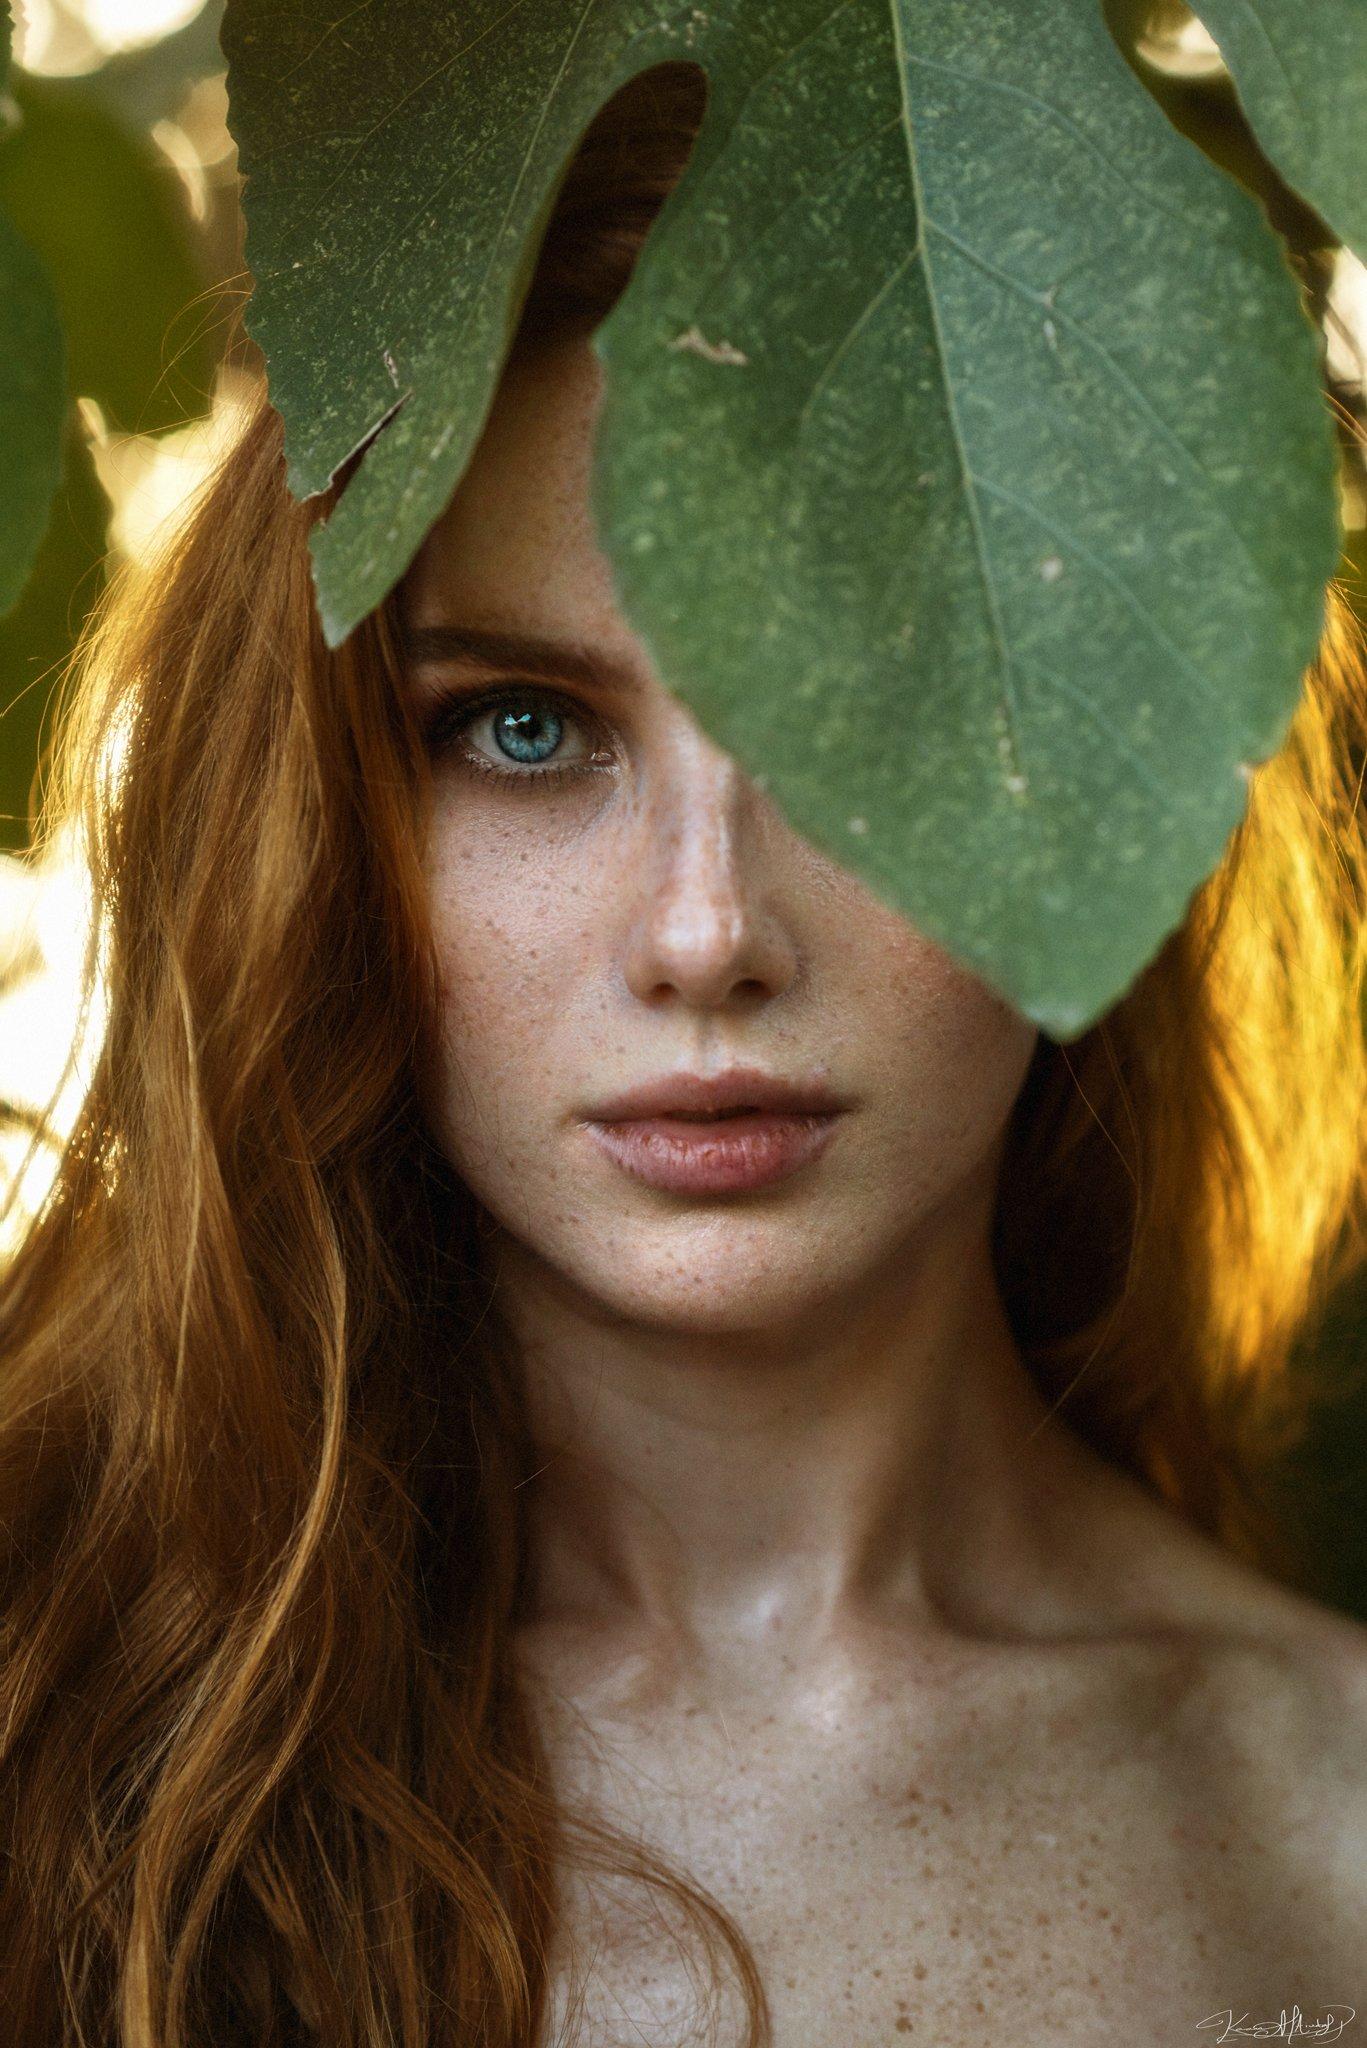 portrait, art, 85mm, eye, beauty, sunset, natural light, nikon, beautiful, freckles, ginger, colors, Каан Алтындал